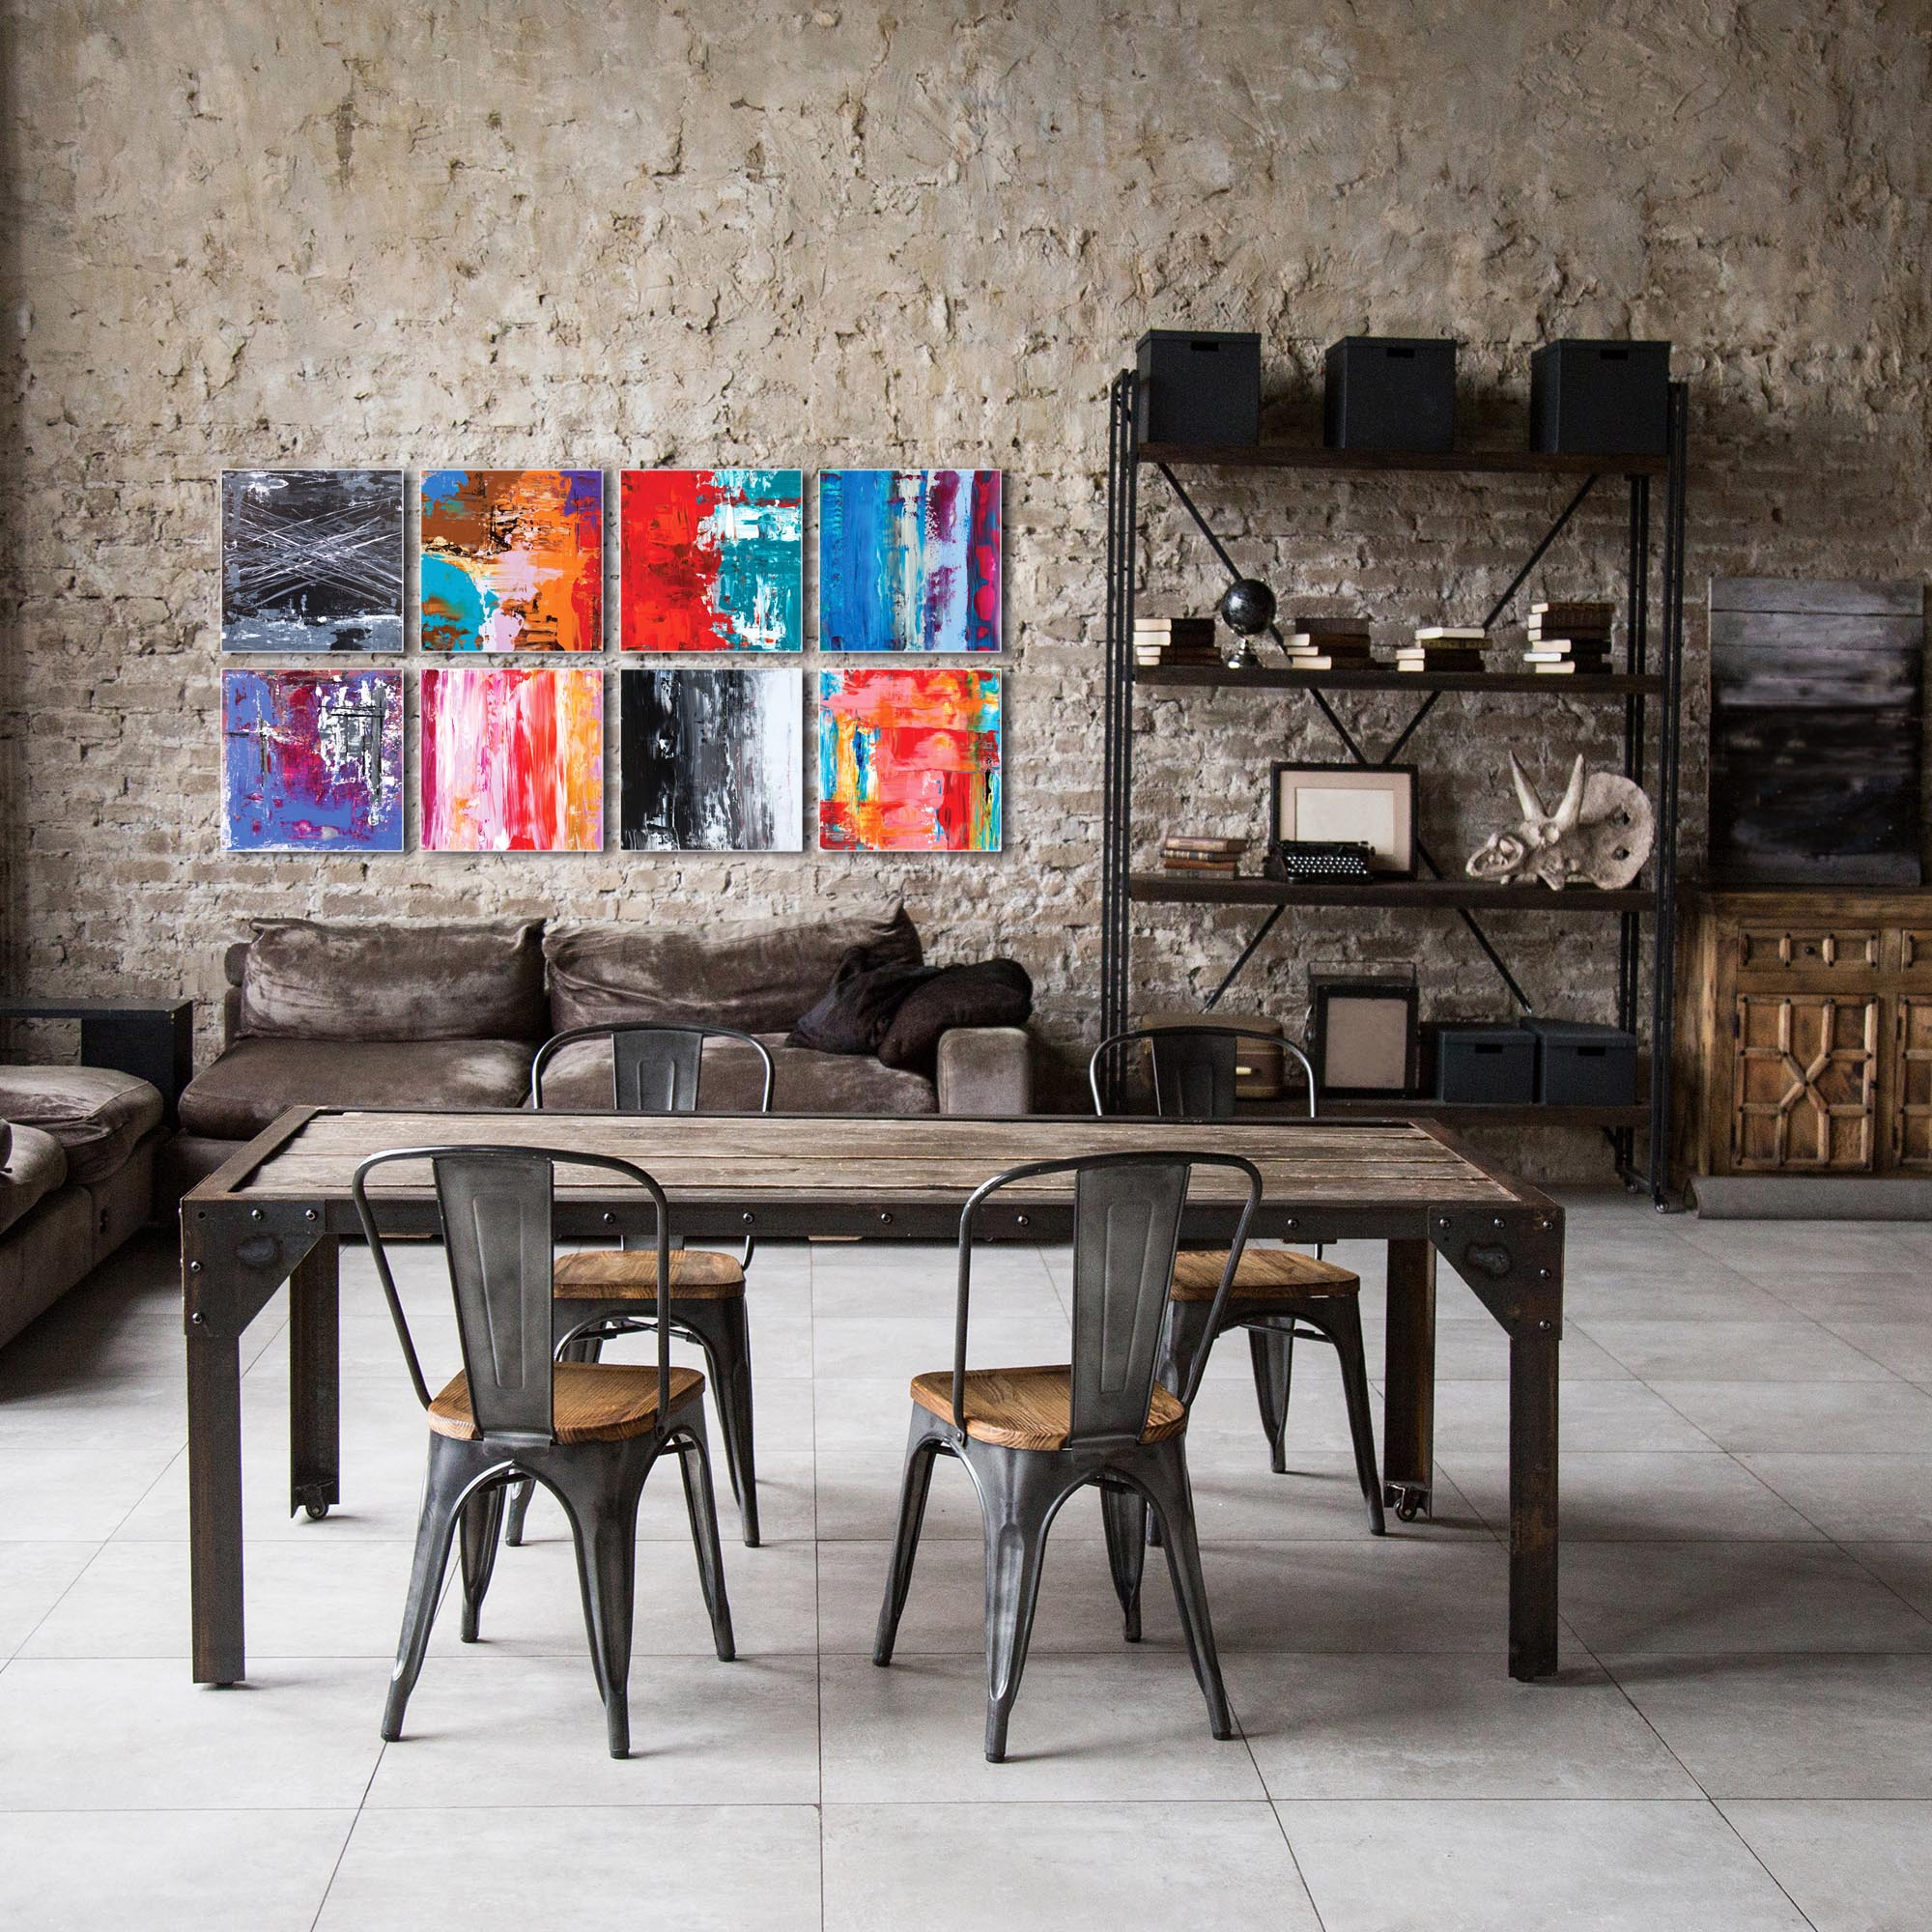 Abstract Wall Art 'Urban Windows Large' - Urban Decor on Metal or Plexiglass - Image 3